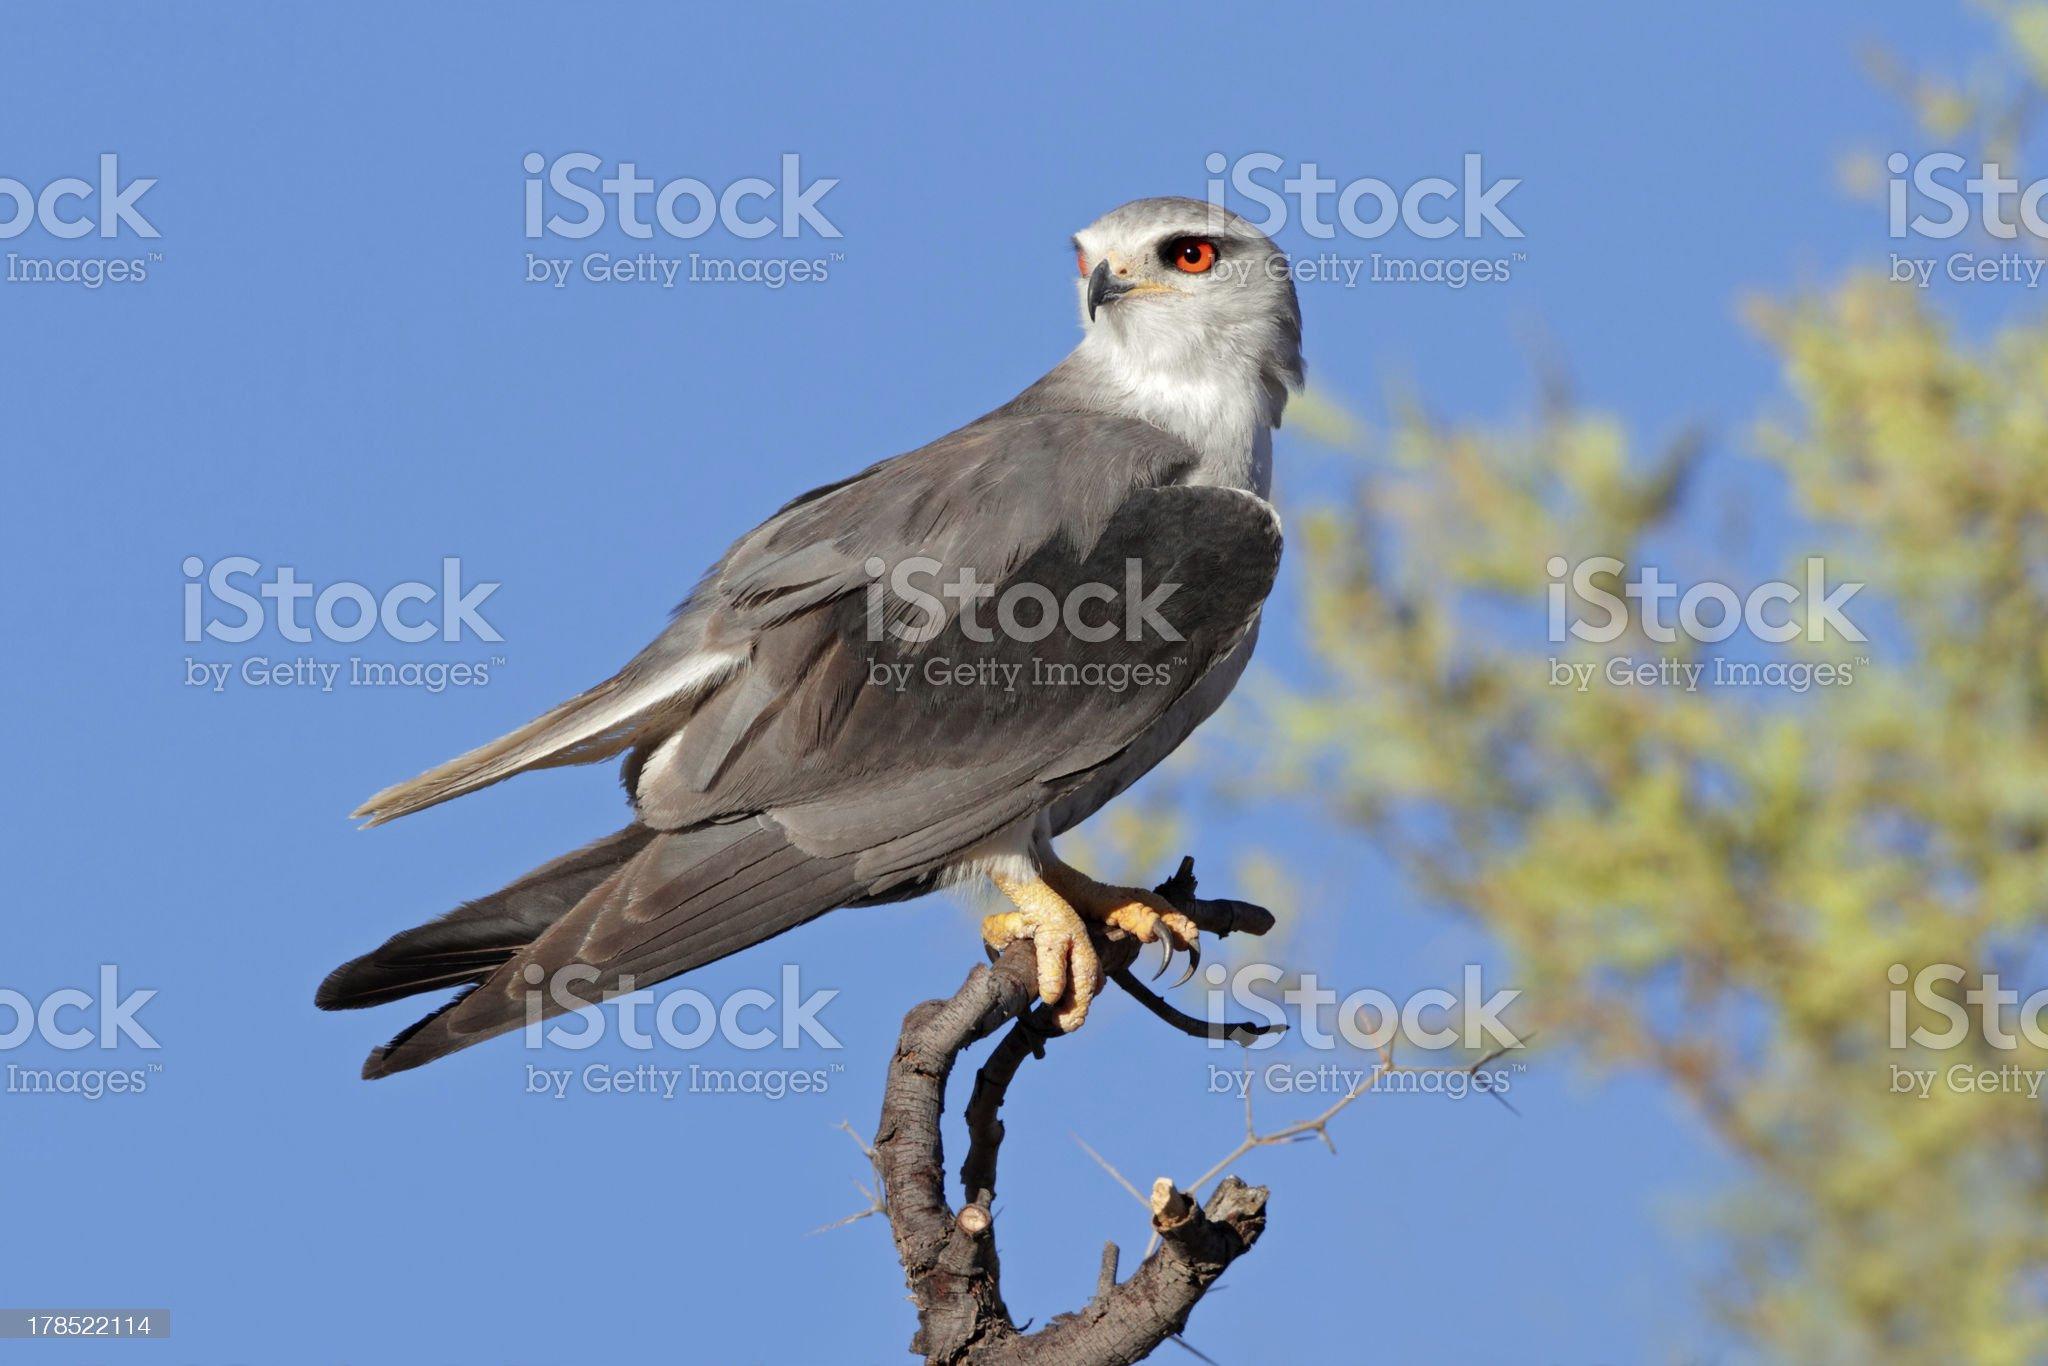 Black-shouldered kite royalty-free stock photo